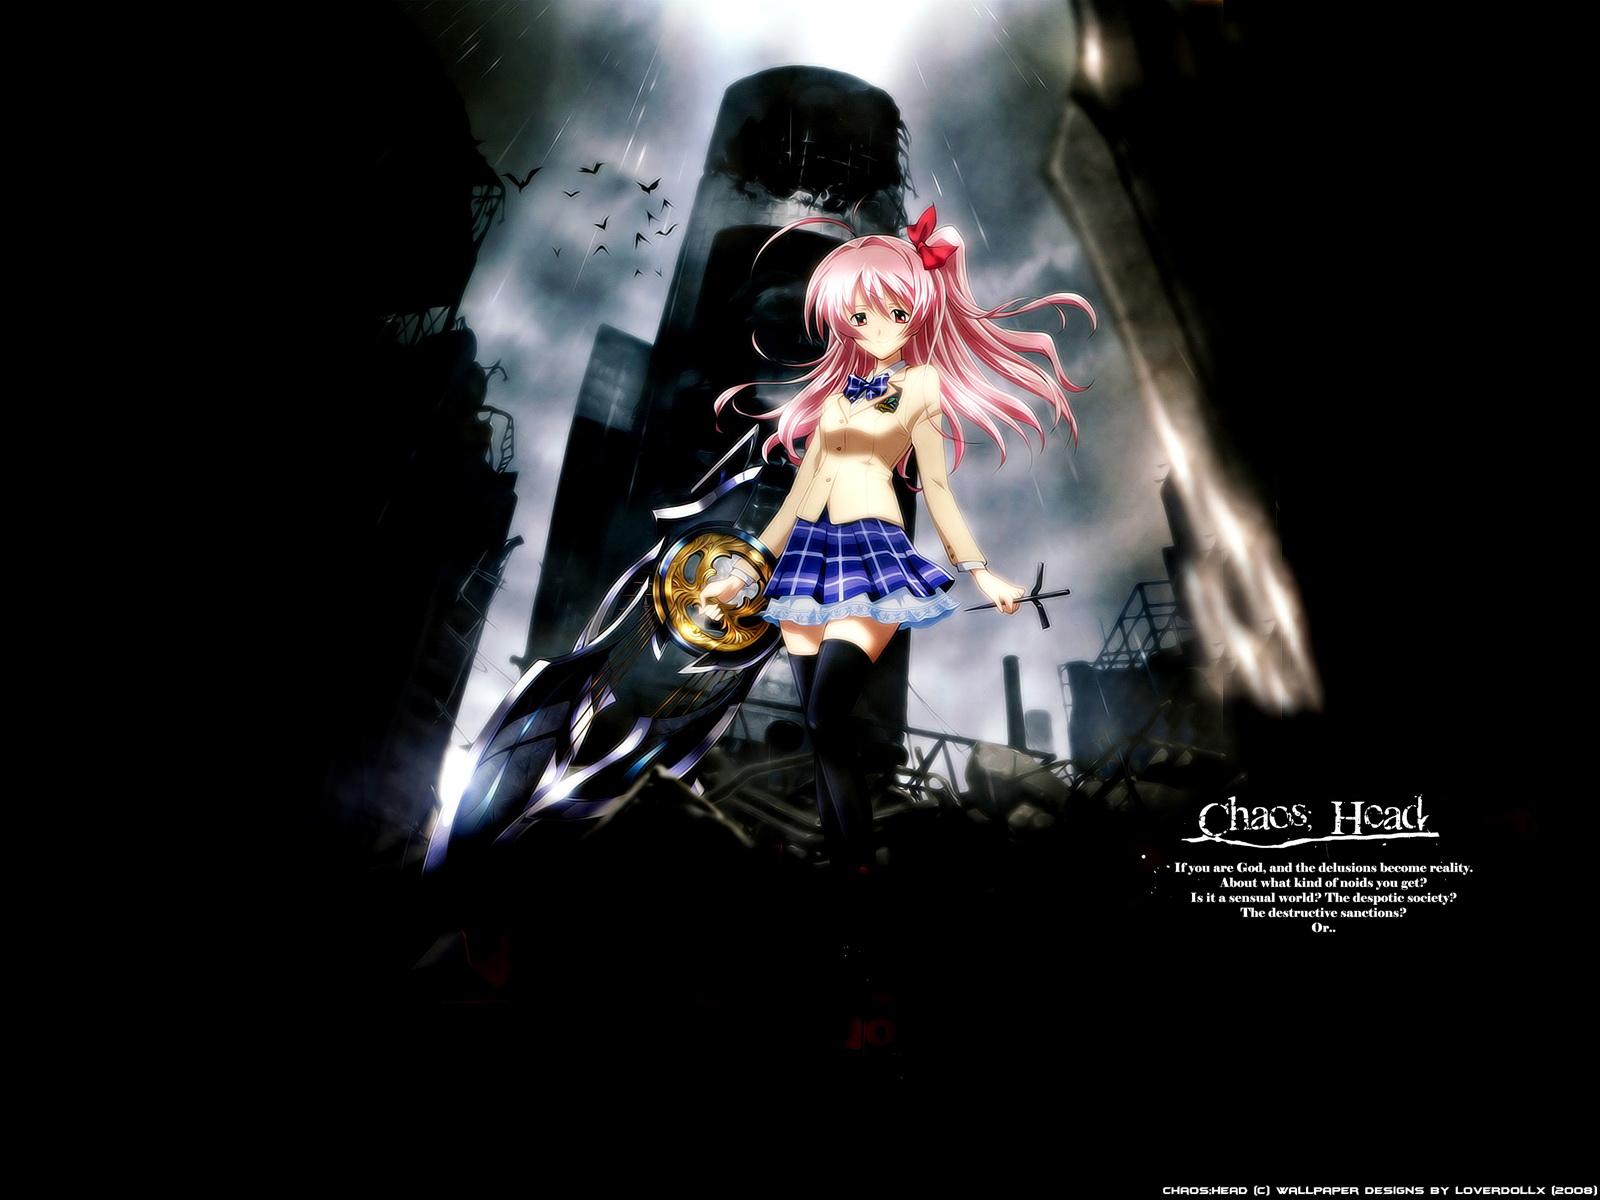 Minitokyo_Chaos_Head_Wallpapers_367970.jpg